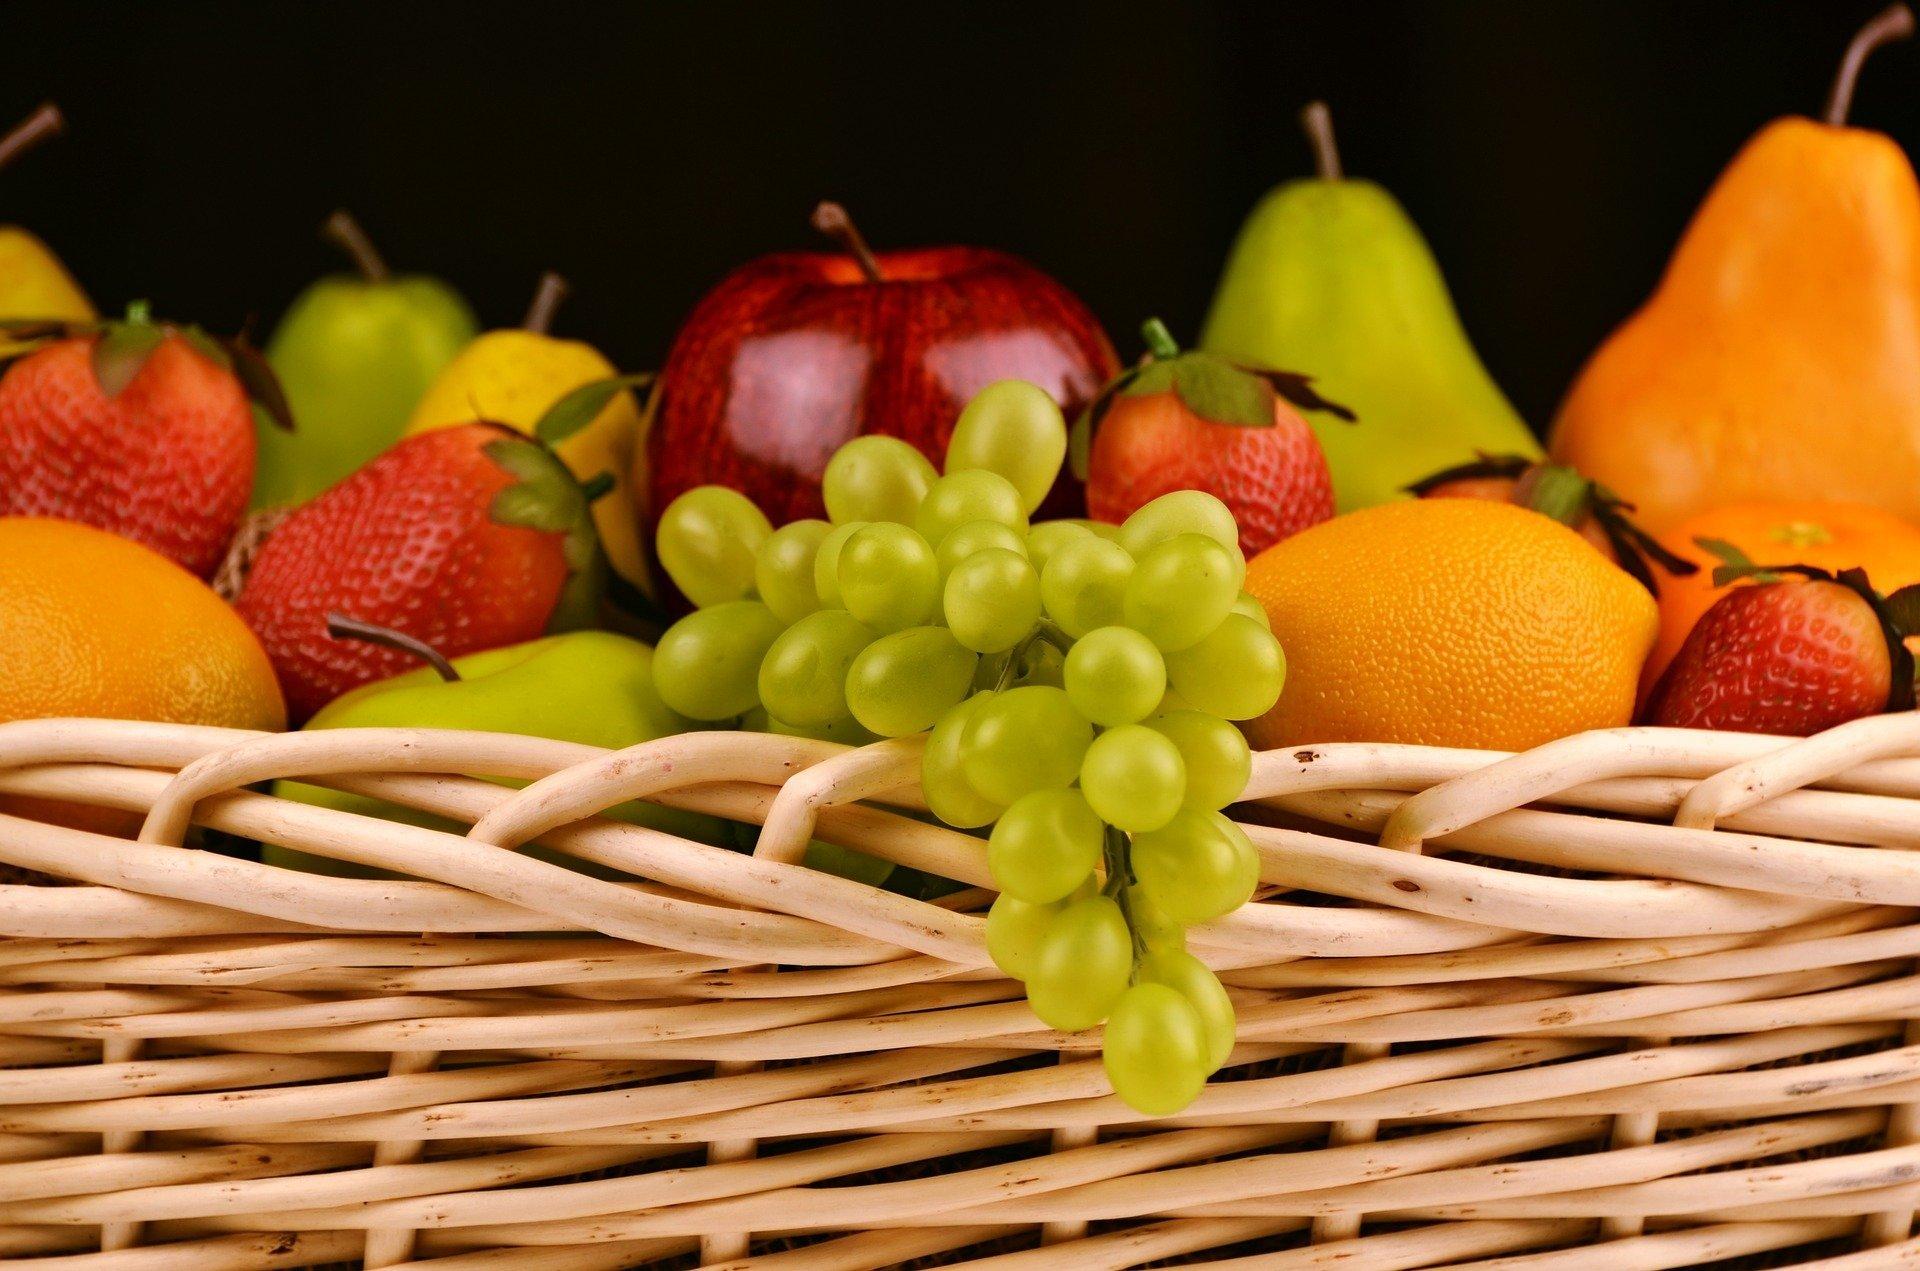 fruit-basket-1114060_1920